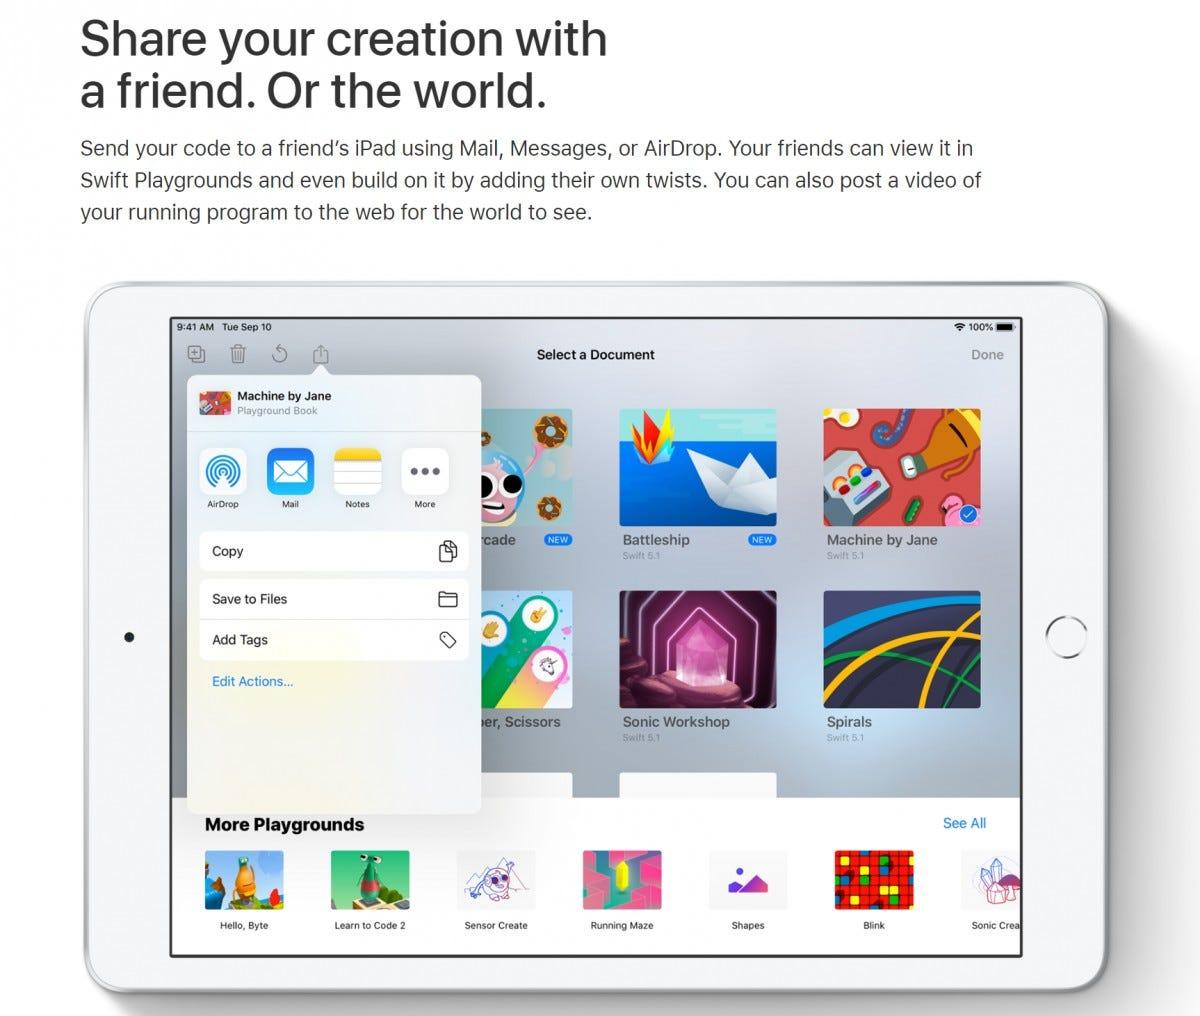 Swift Playgrounds App